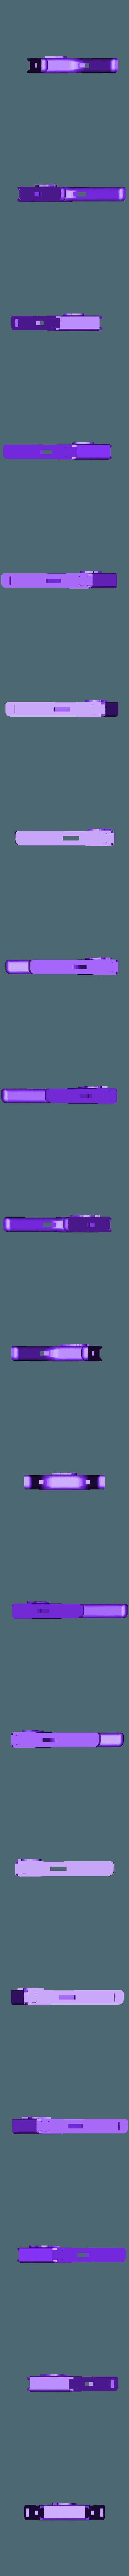 Nook_Animal_Crossing_Switch_Joy_Con_Holder.stl Download free STL file Nook Animal Crossing Switch Joy-Con Holder • 3D printing template, ismaan